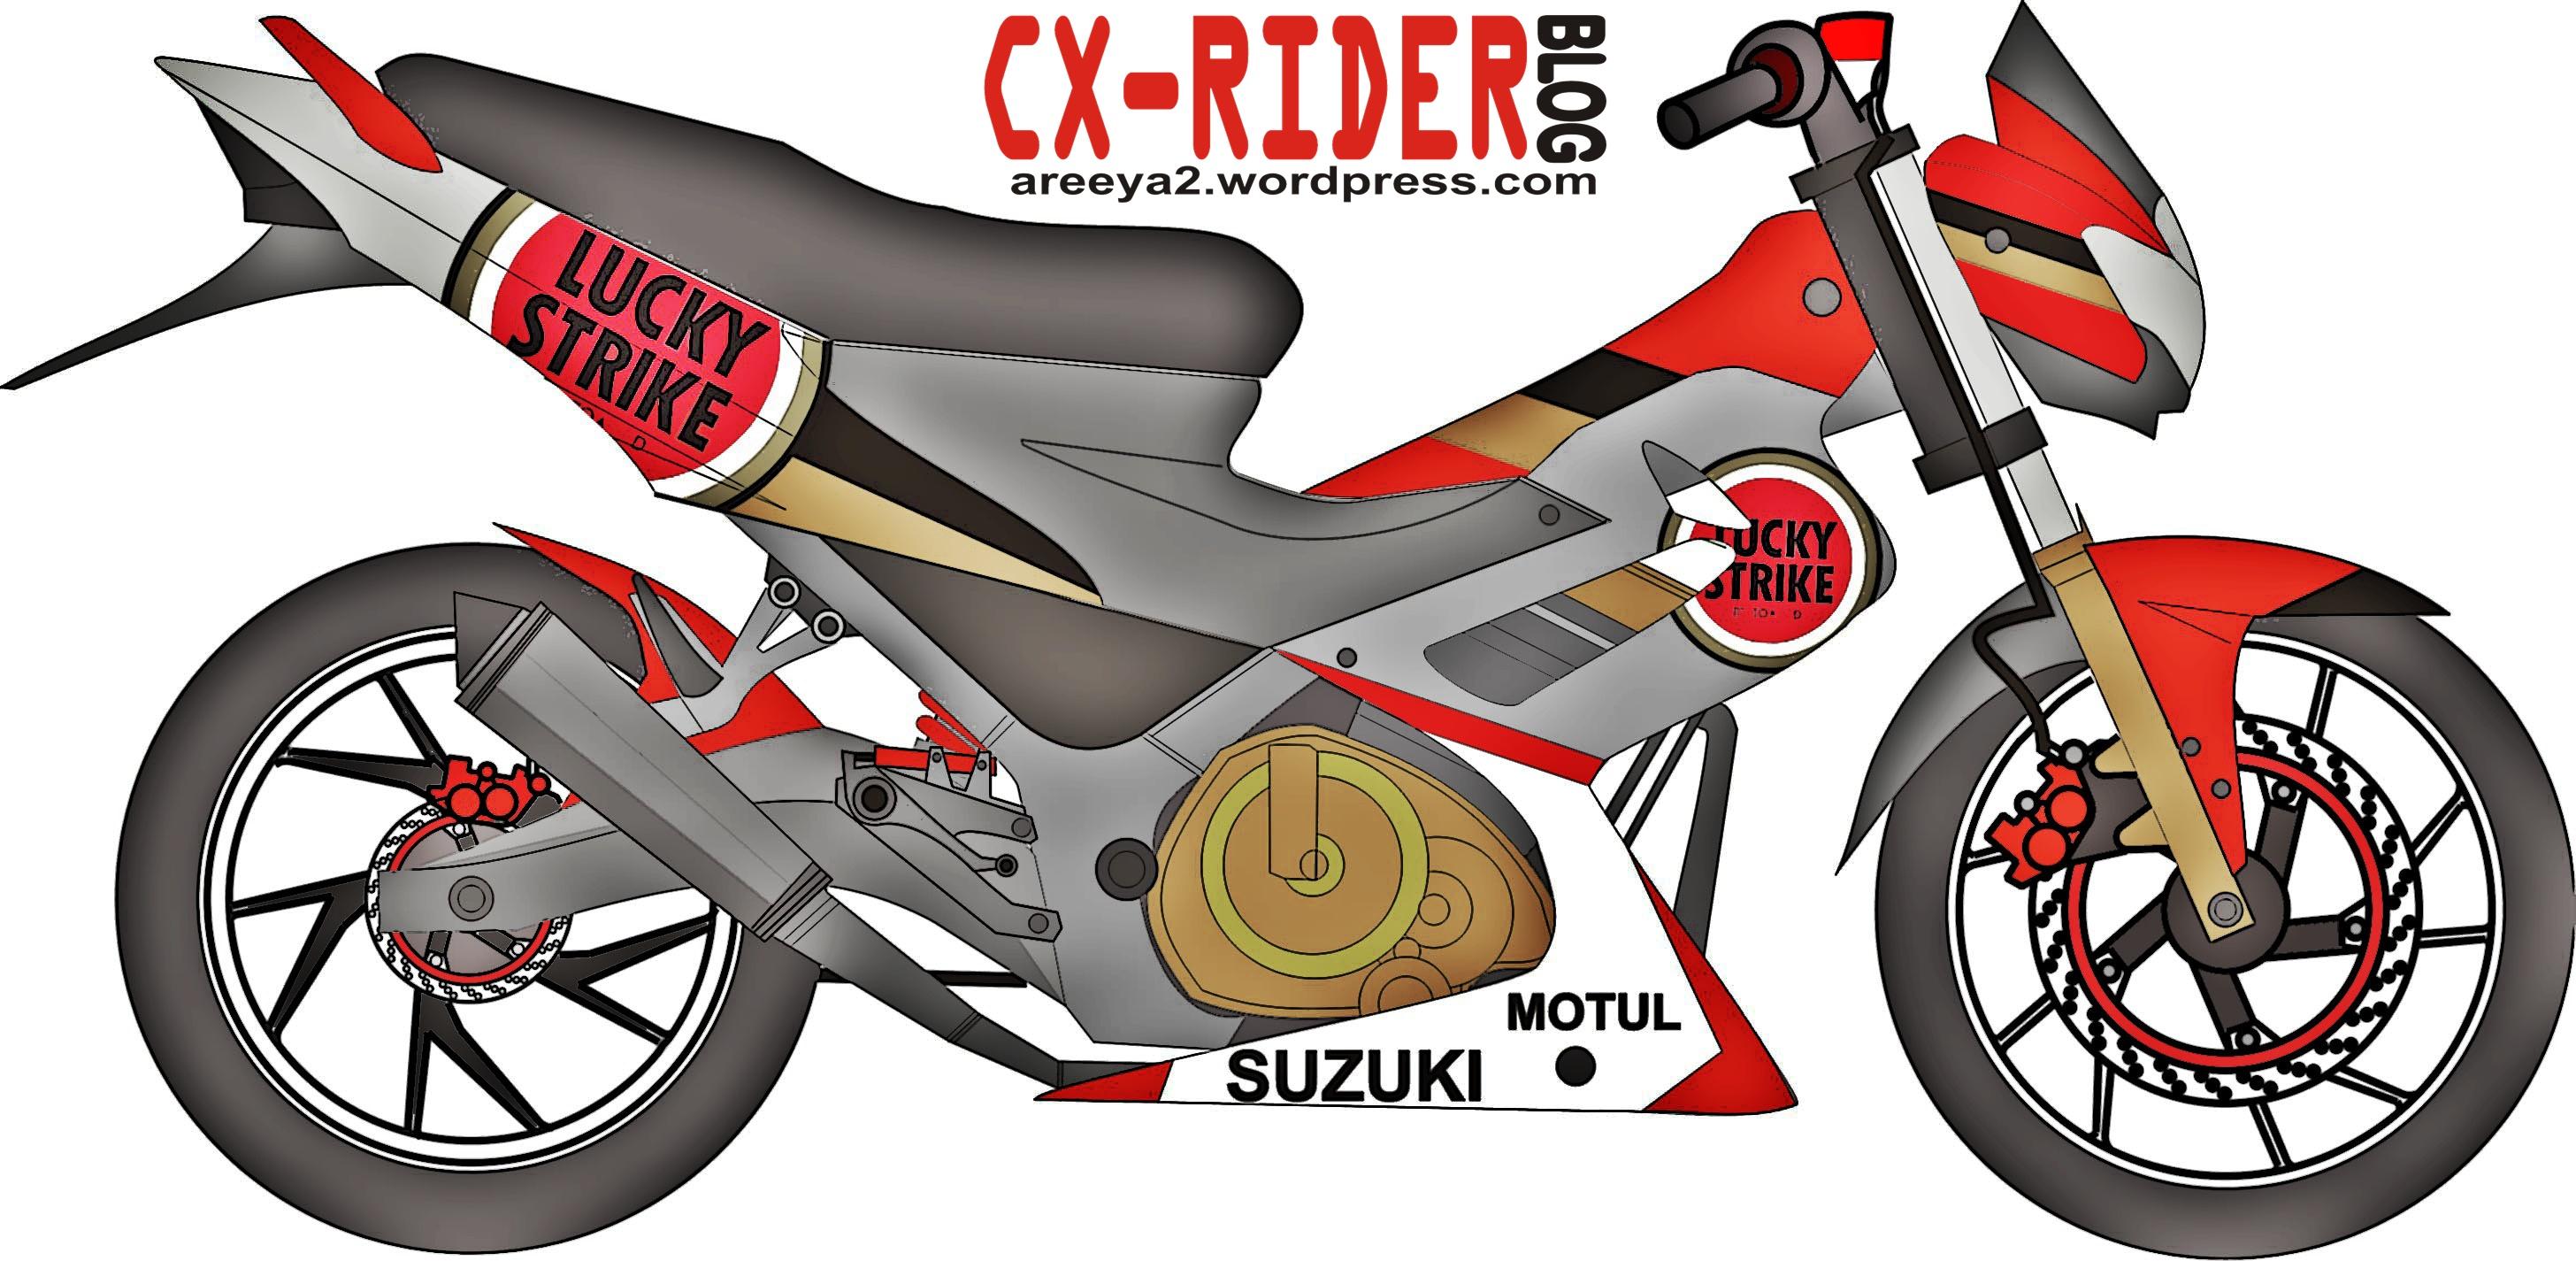 Gambar Kartun Motor Satria Galeriotto